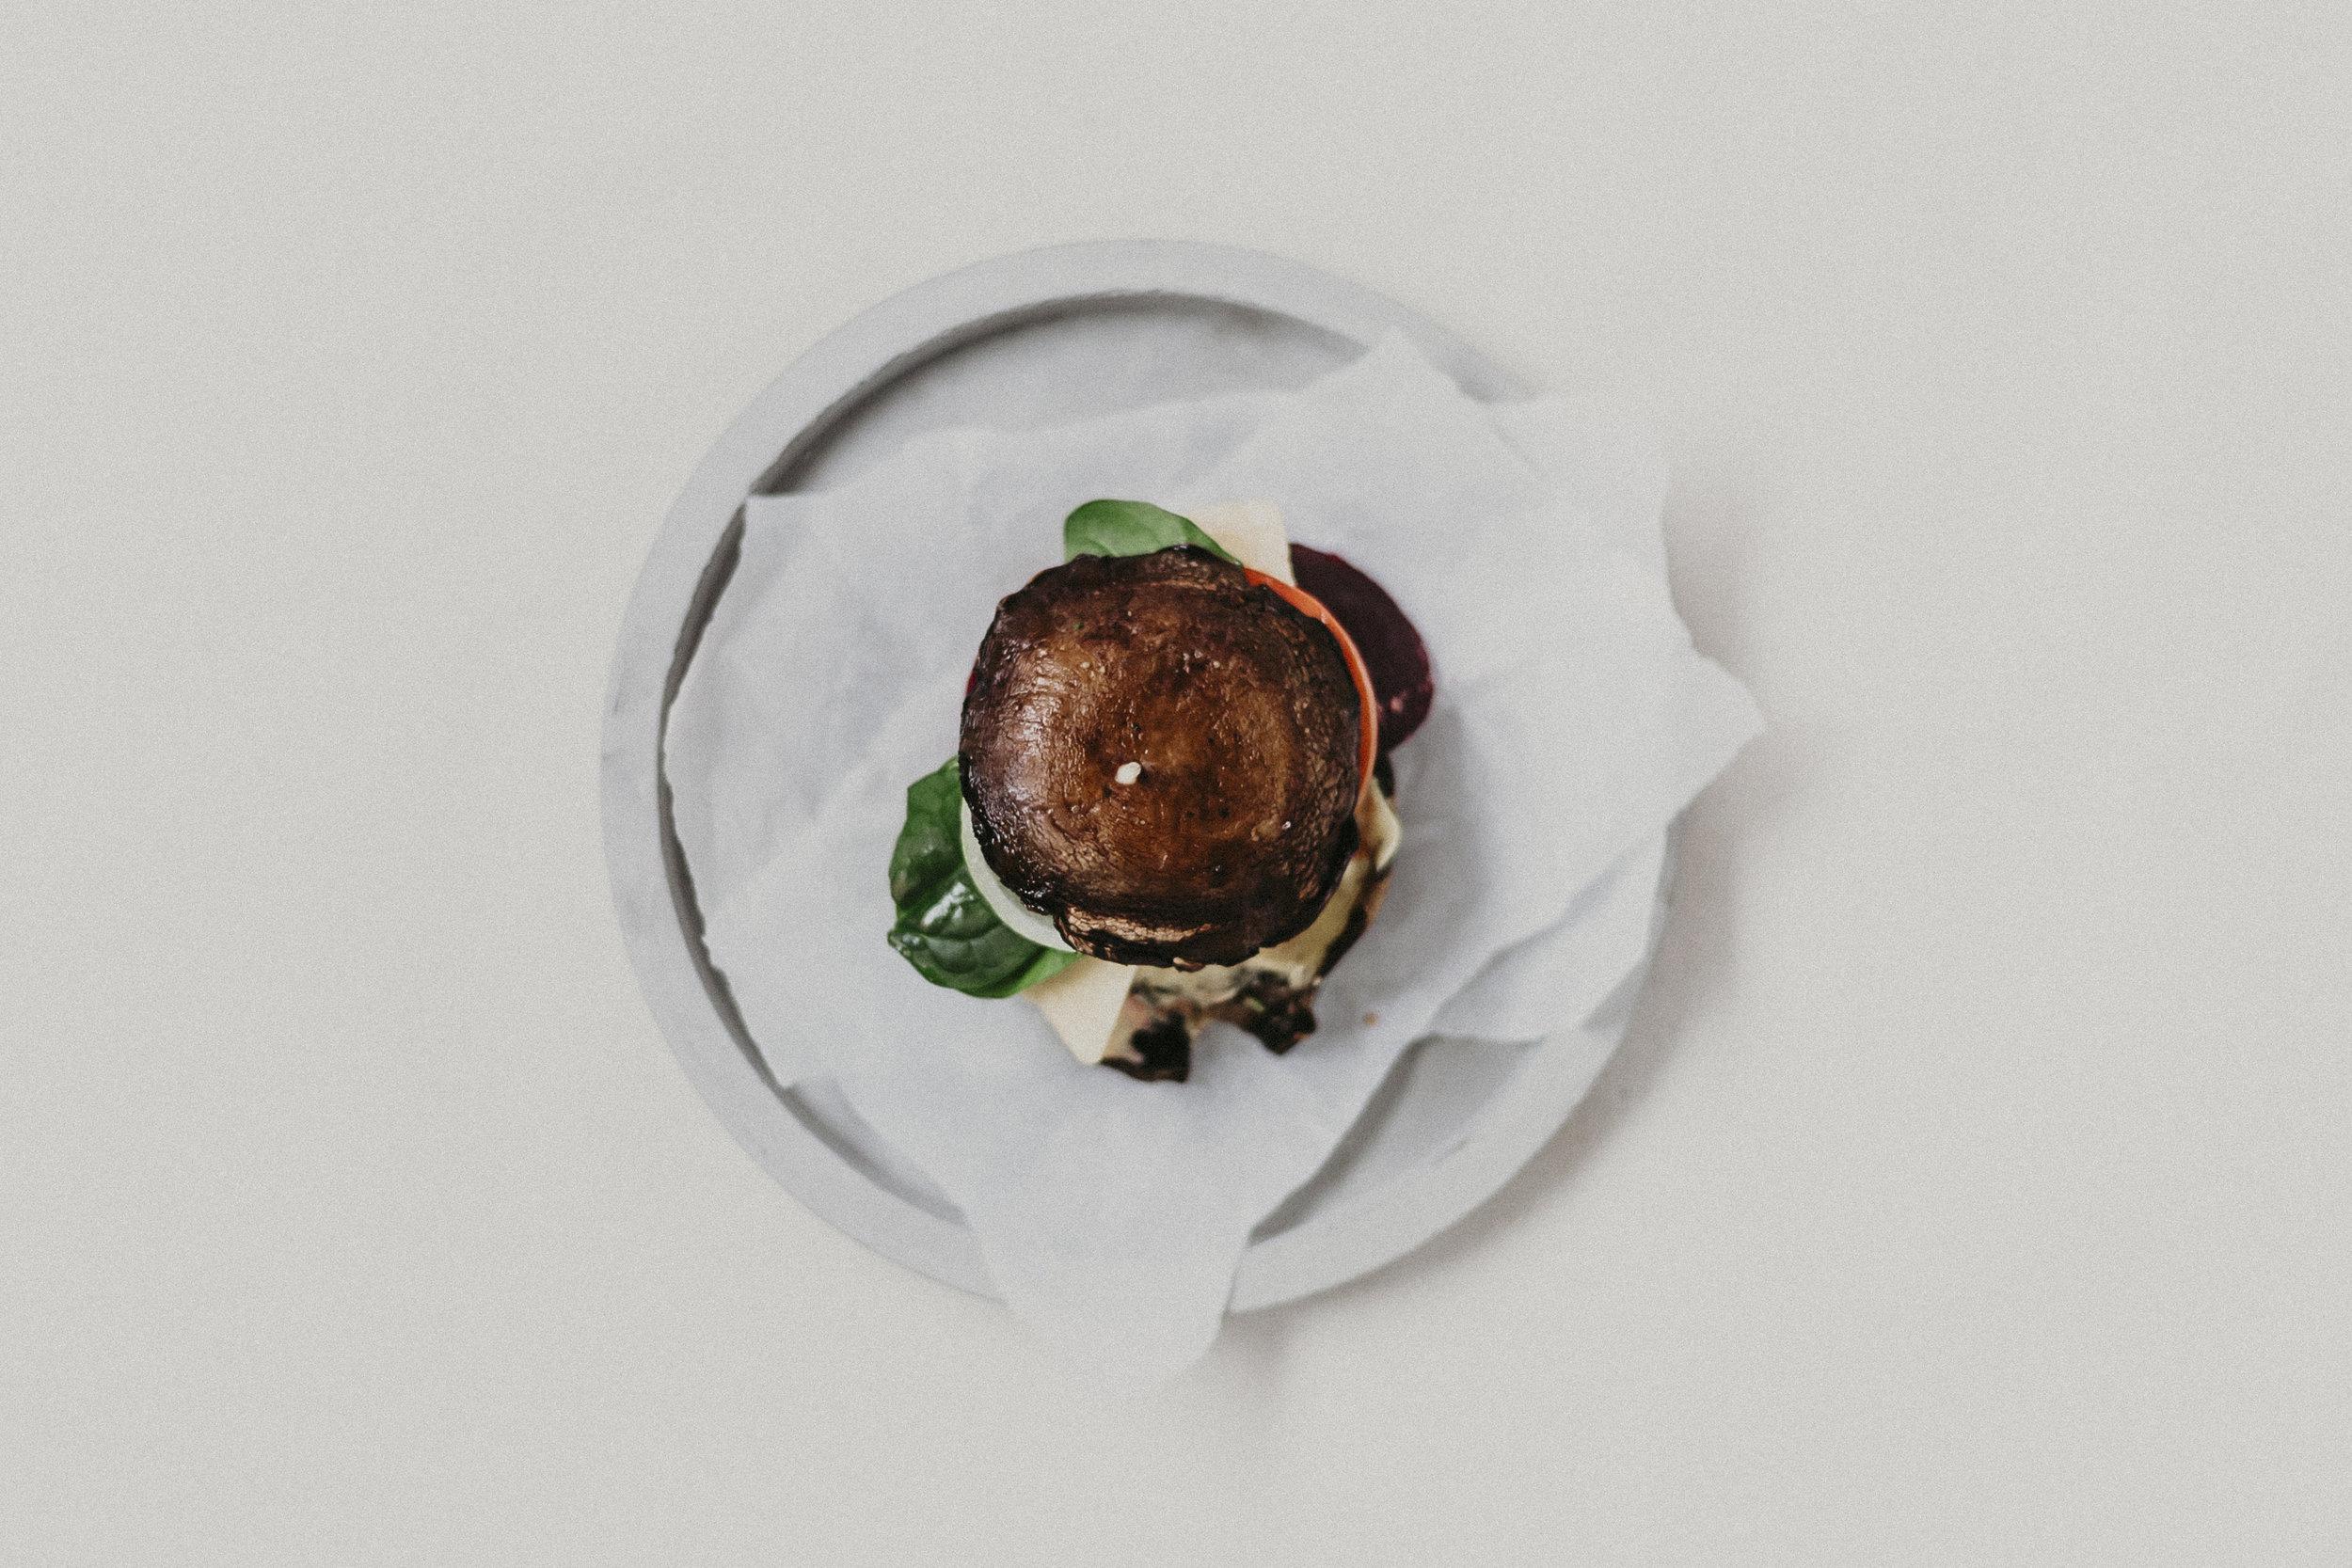 CONCLUSION - Simple, delicious & quick 8/10